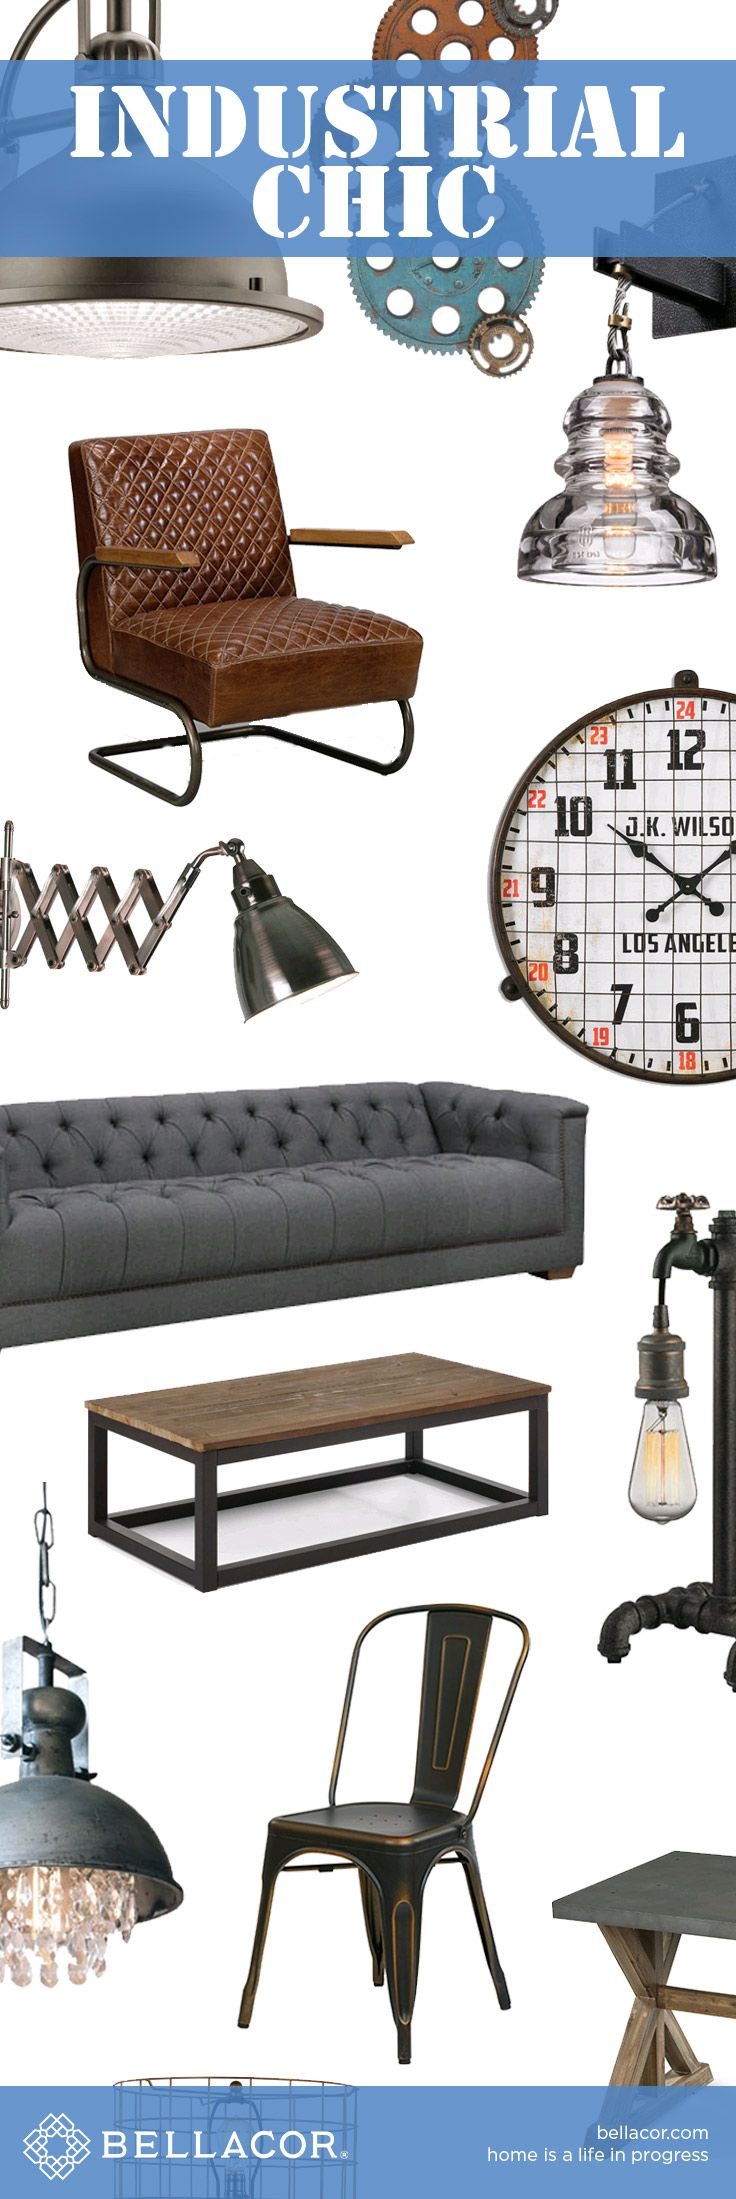 bd furniture and decor.htm pin by kaylee eylander diy diy projects  easy recipes on 509  kaylee eylander diy diy projects